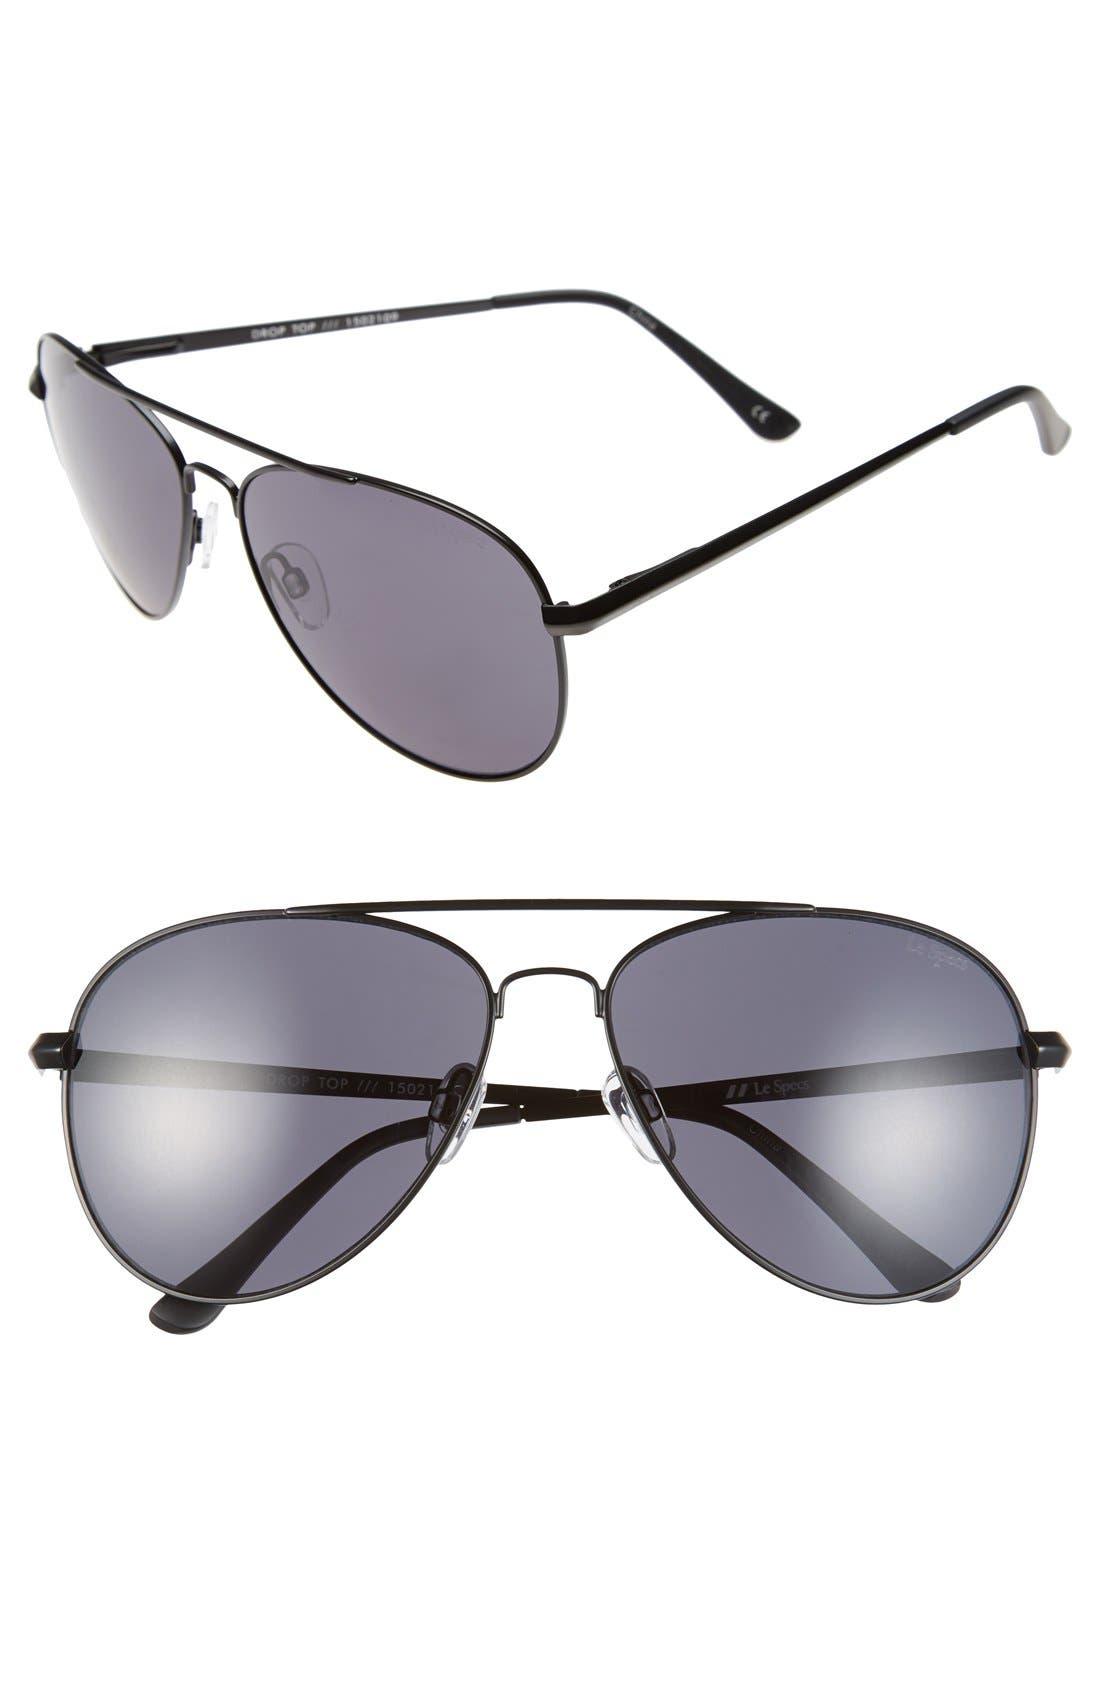 Main Image - Le Specs 'Drop Top' 60mm Aviator Sunglasses